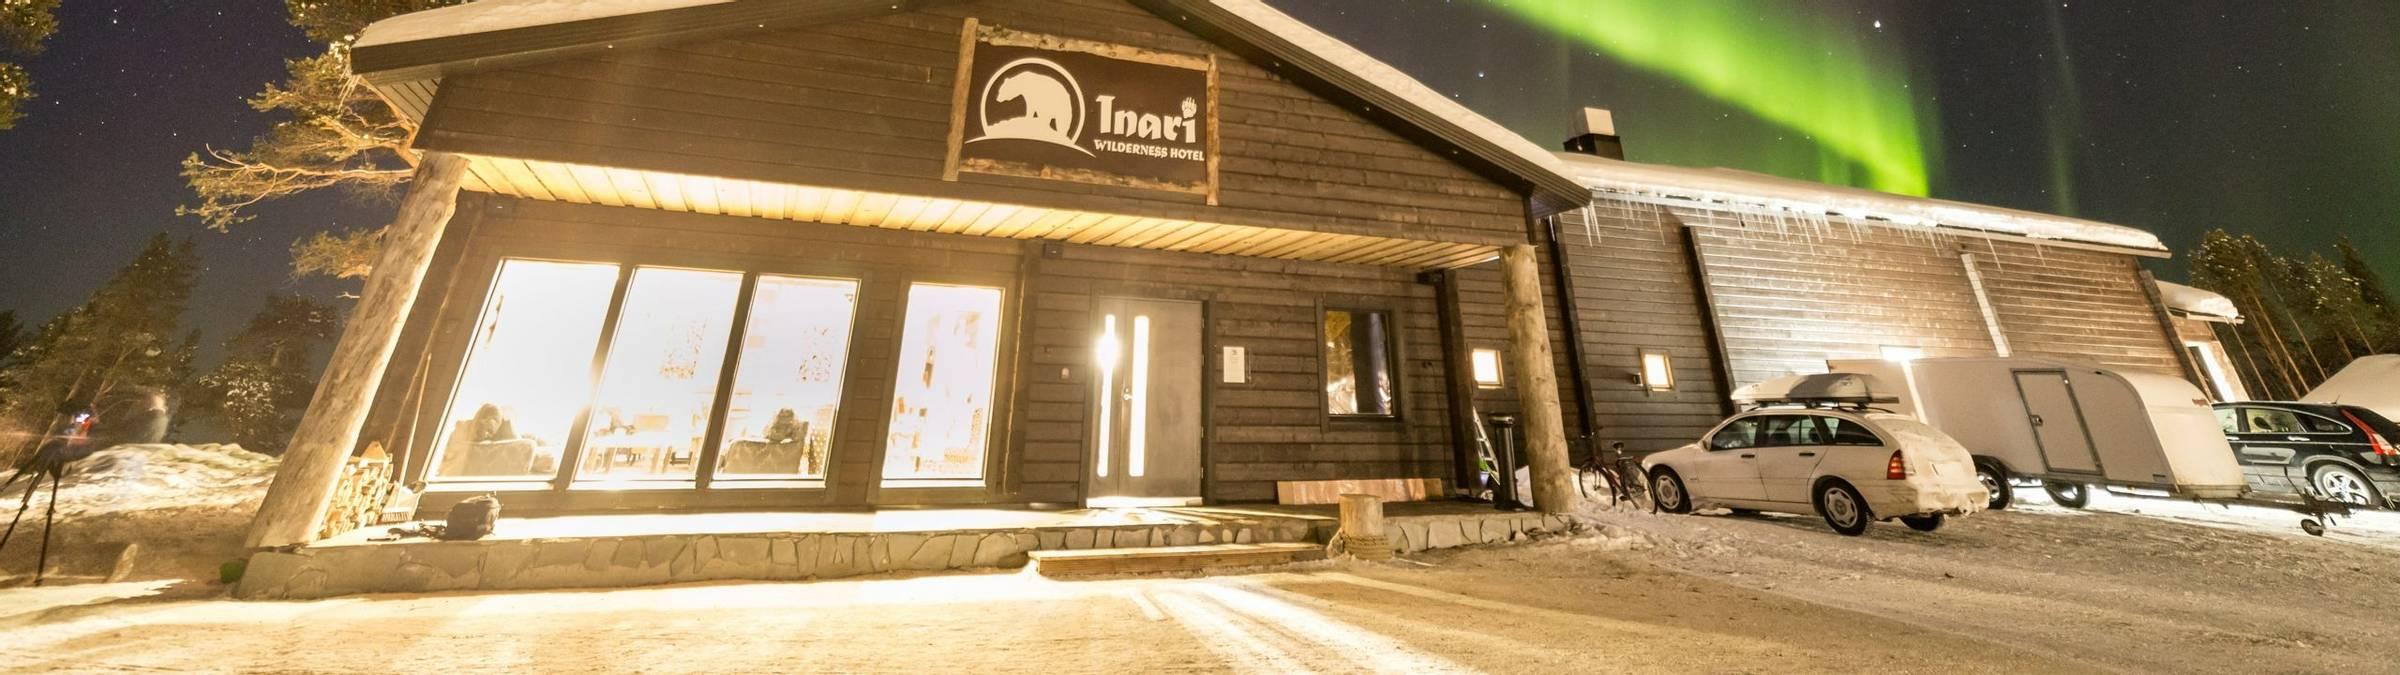 IMG 2901   Inari   Credit Matt Robinson